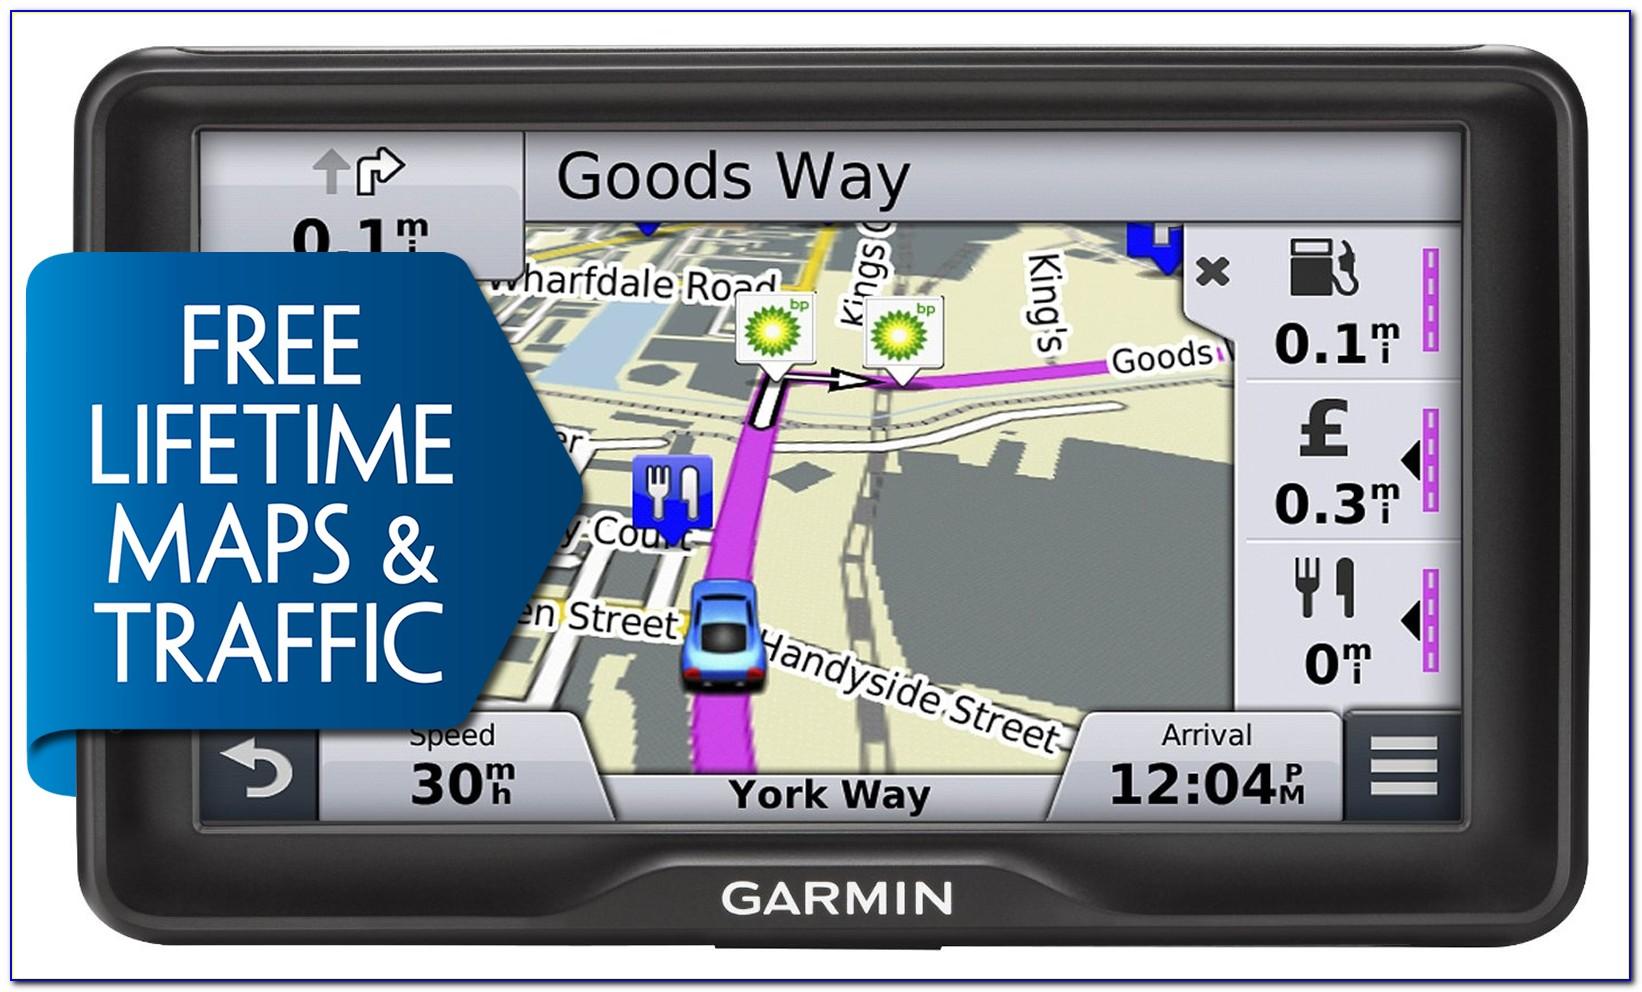 Garmin Maps Share Online